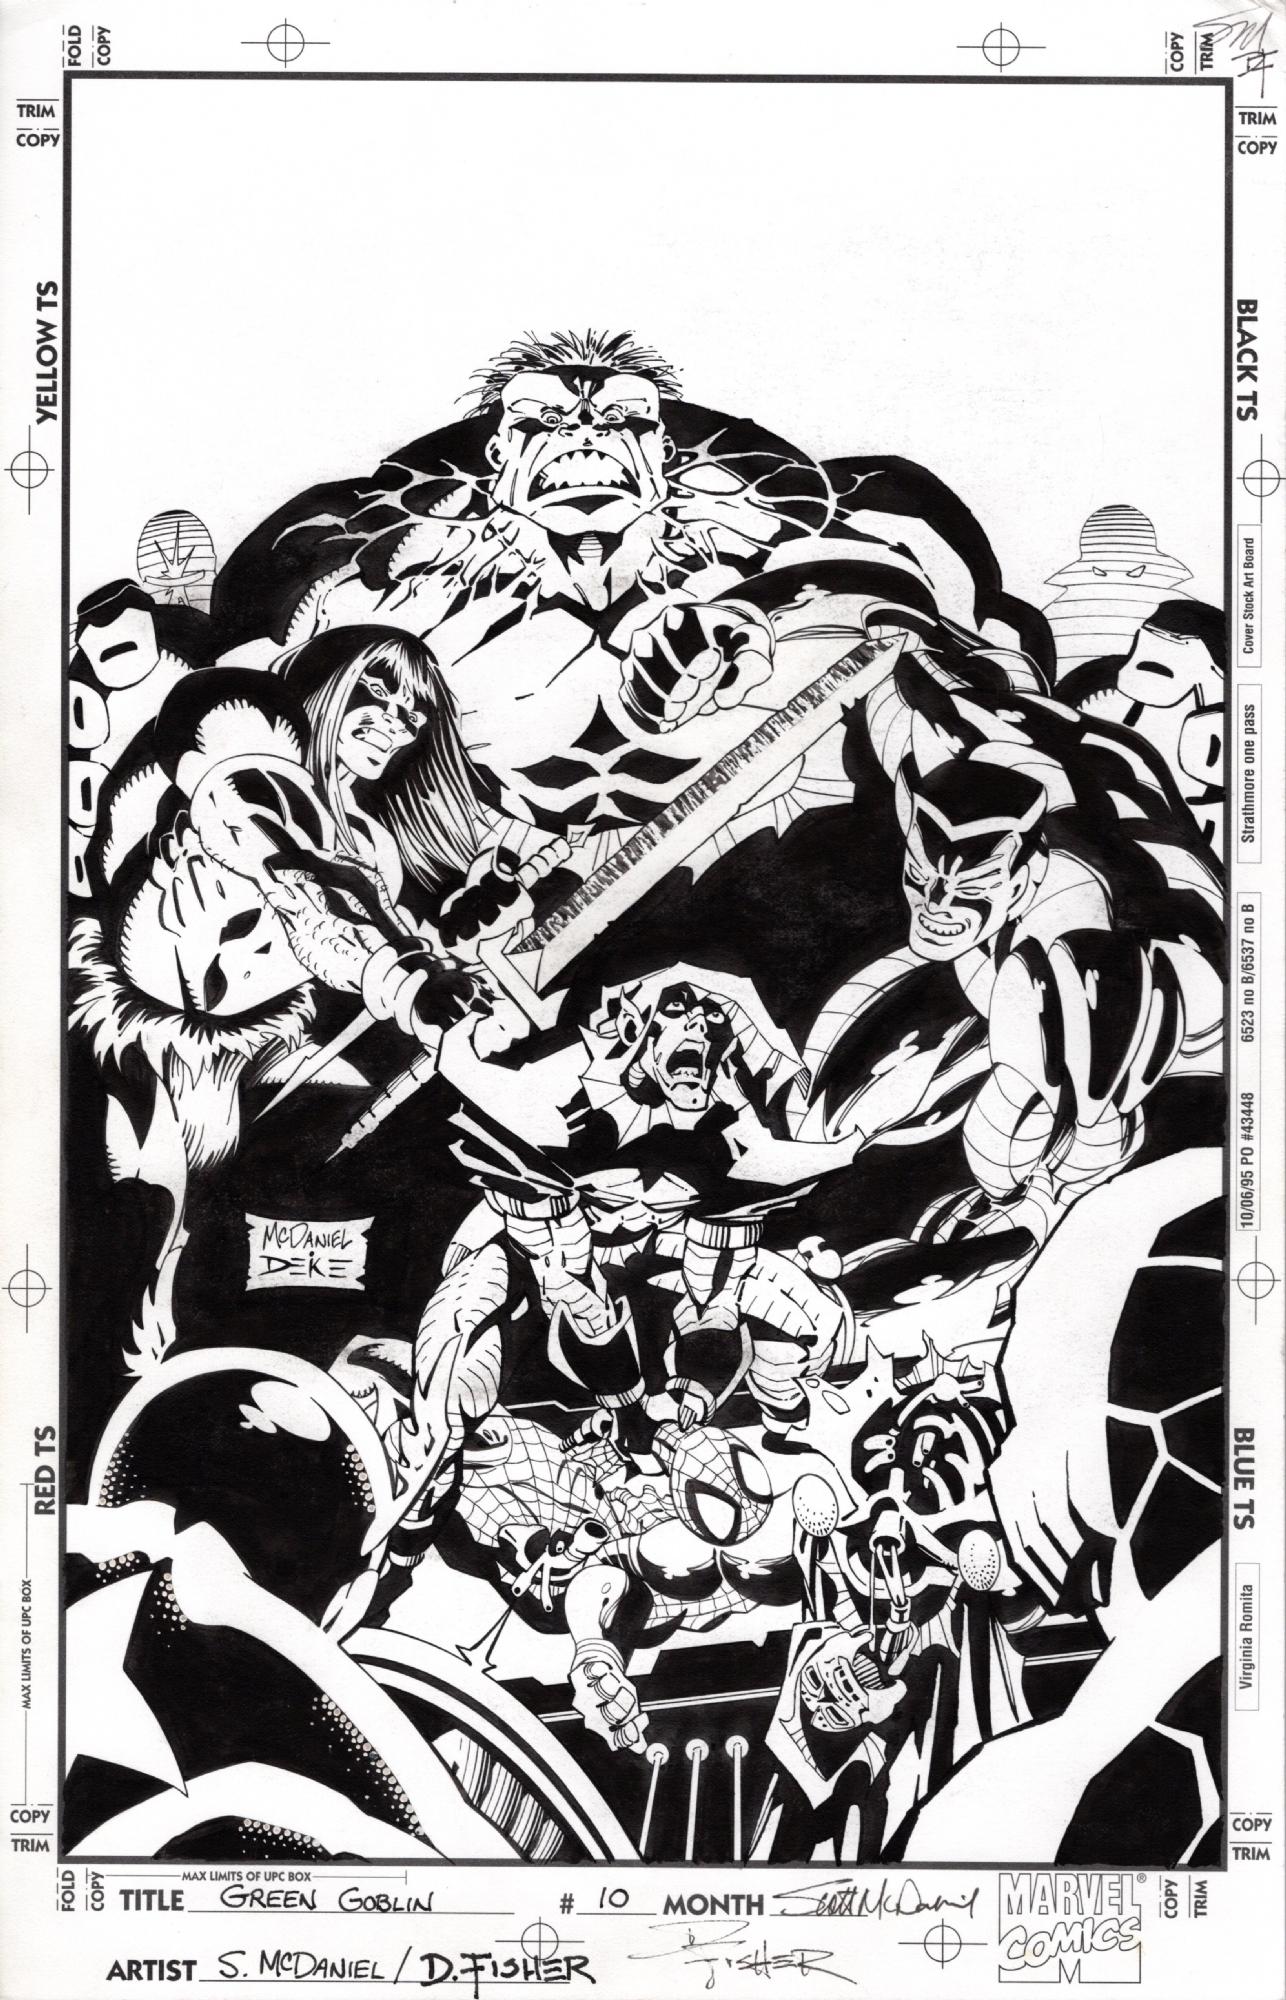 green goblin vs hulk idea di immagine del eroe Marvel Mashers at Target download image 1286 x 2000